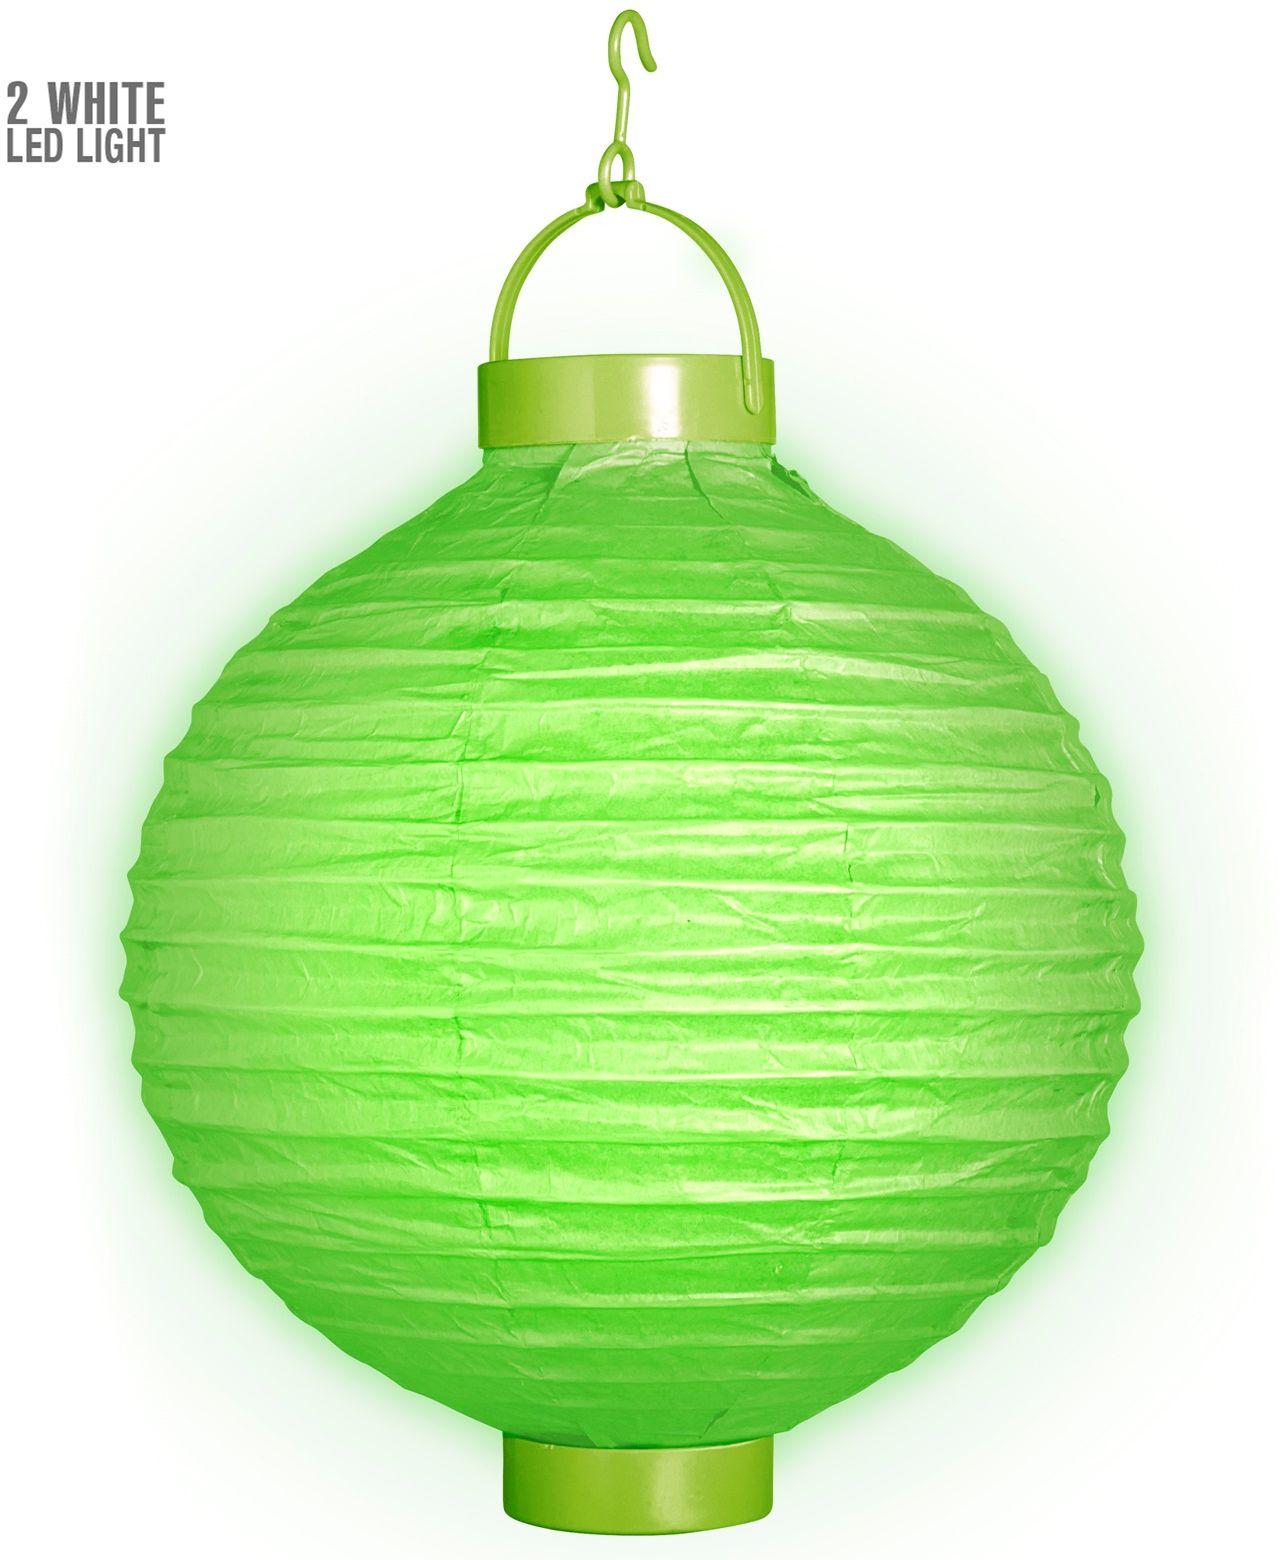 Groene lampion met 2 witte LED lichten